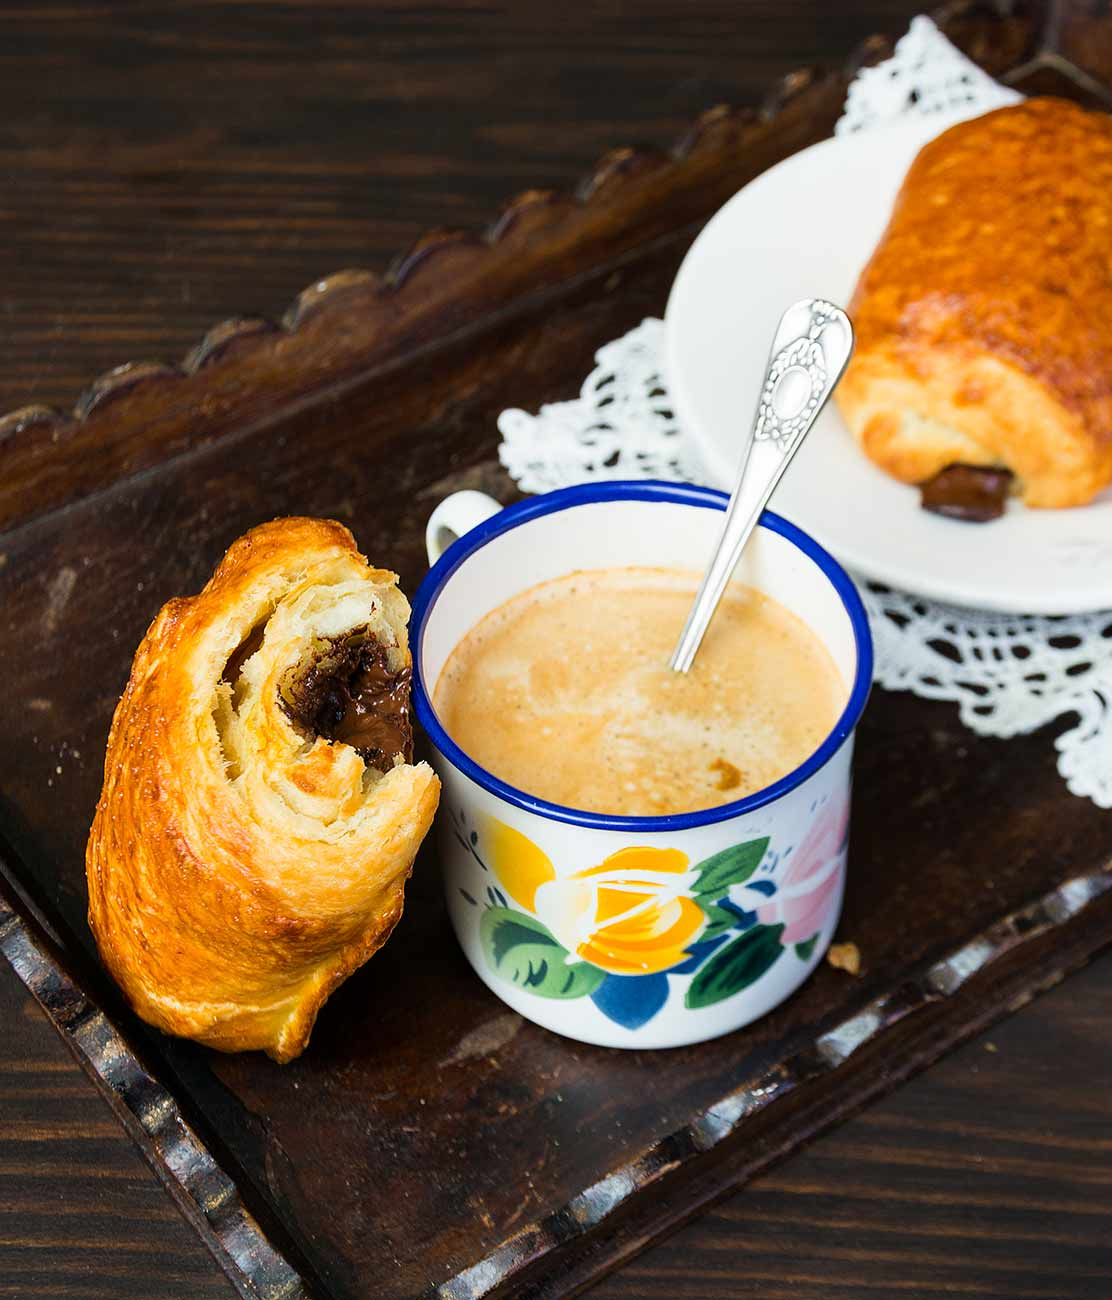 napolitanas, pain aux chocolat, hojaldre